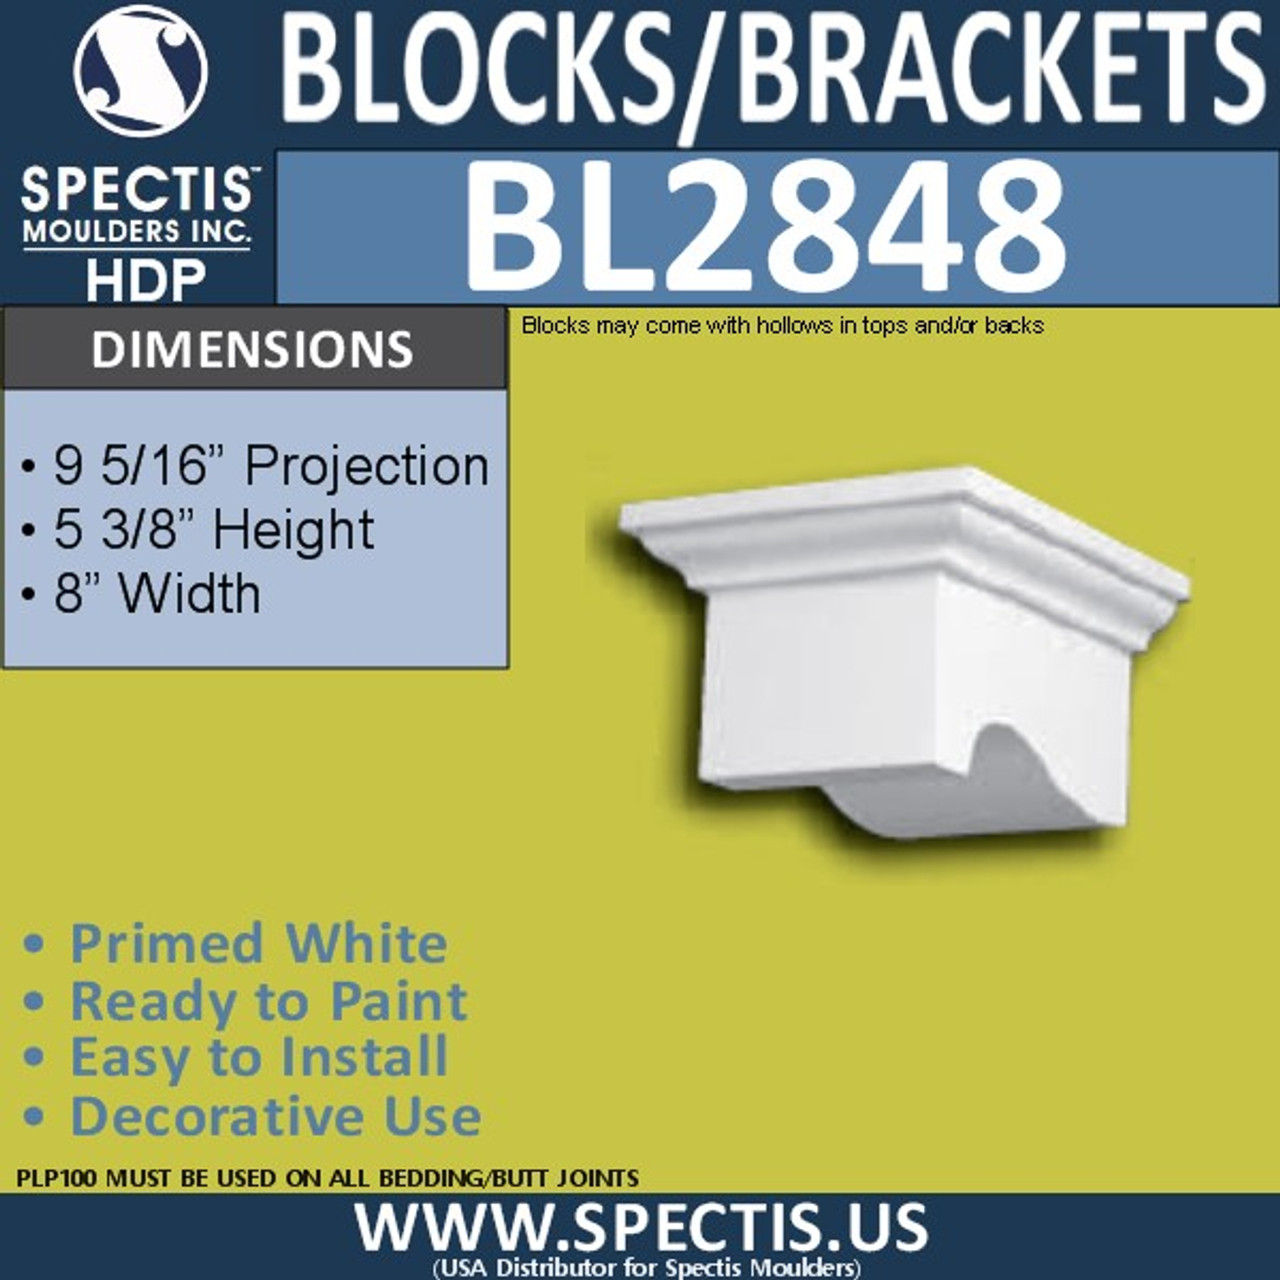 "BL2848 Eave Block or Bracket 8""W x 5.3""H x 9.5"" P"